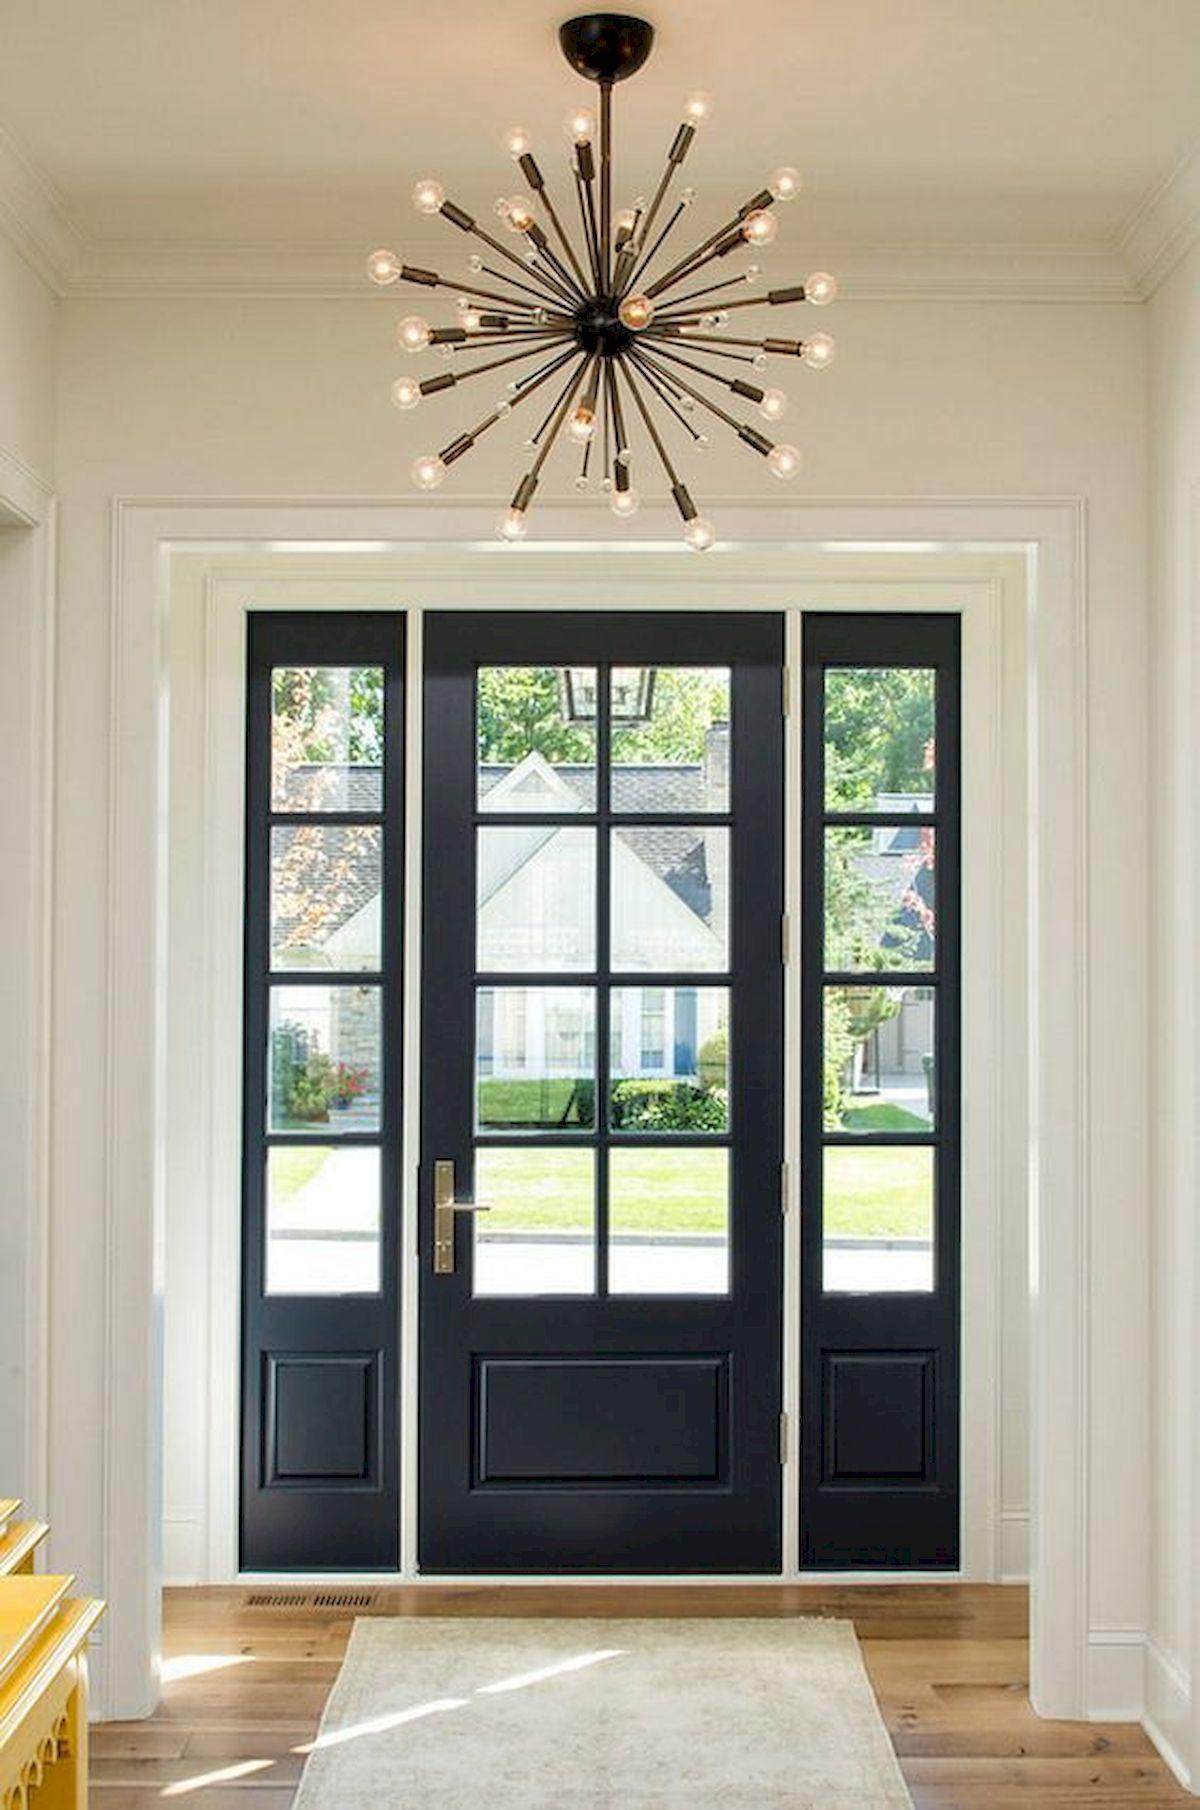 70 Beautiful Farmhouse Front Door Design Ideas And Decor 4 In